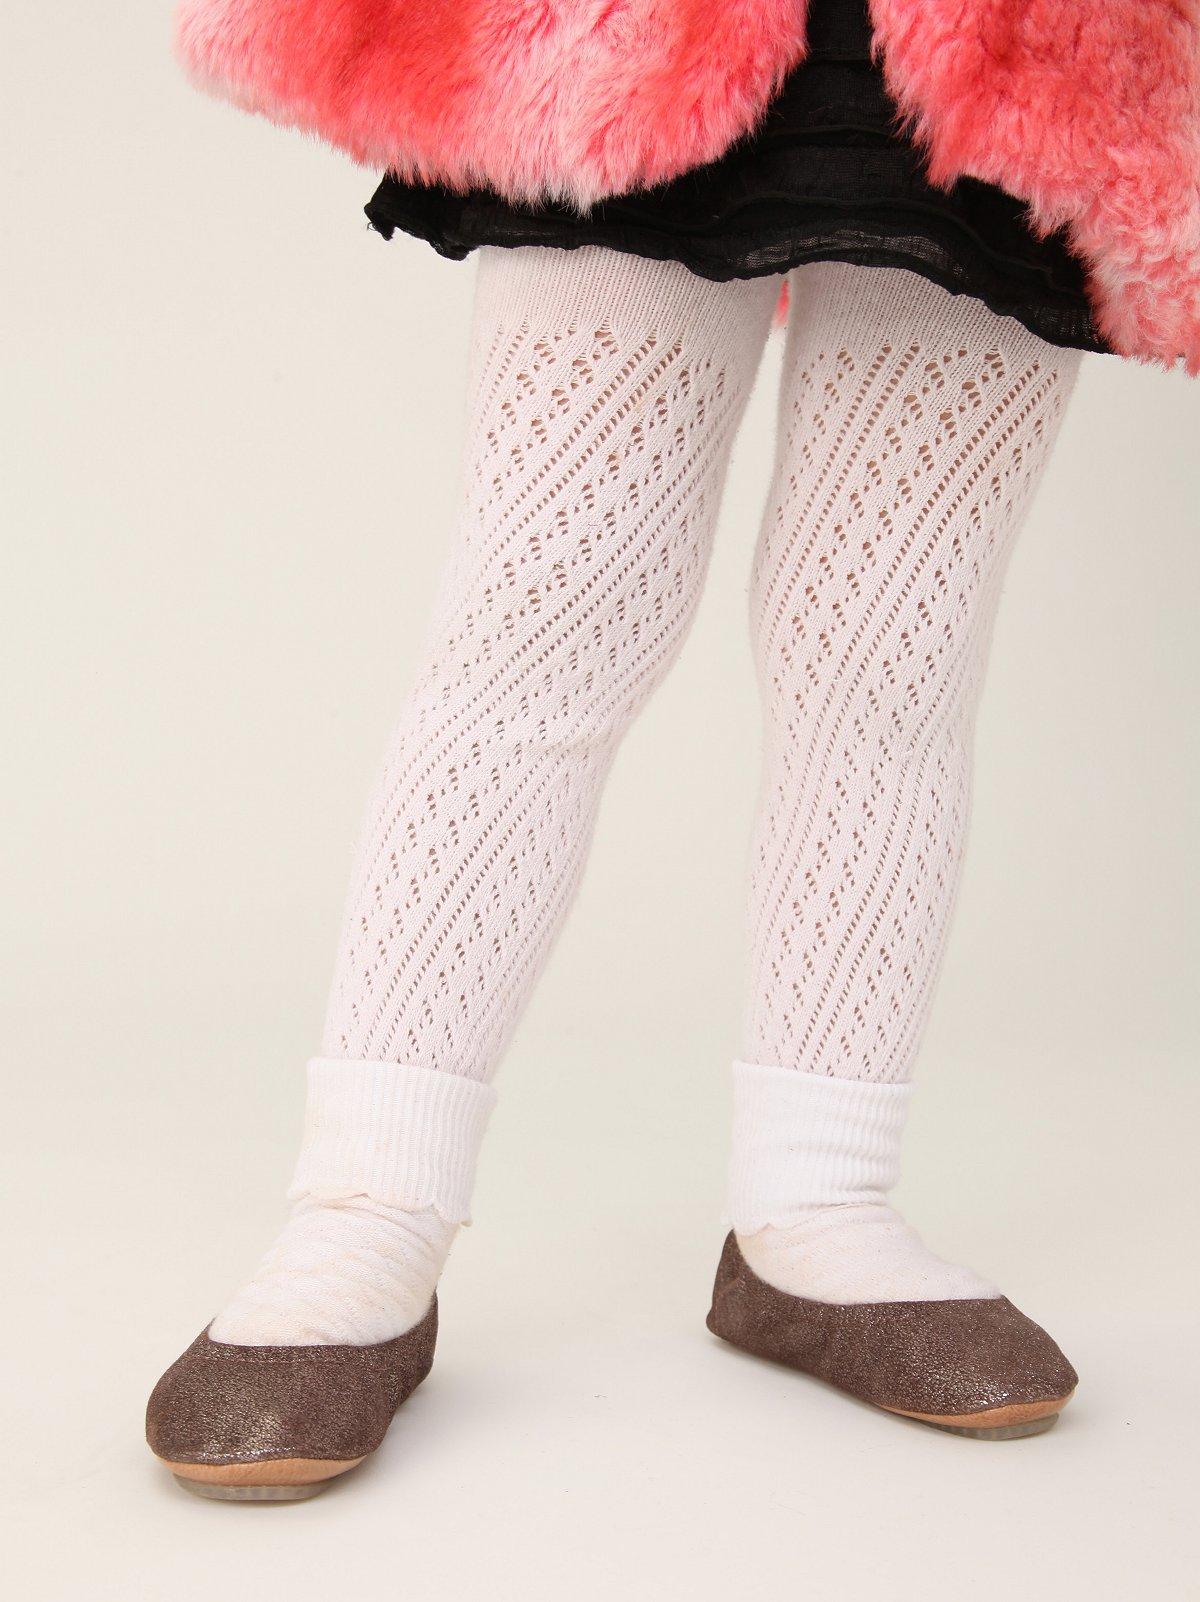 Wee People Organic Ruffled Socks